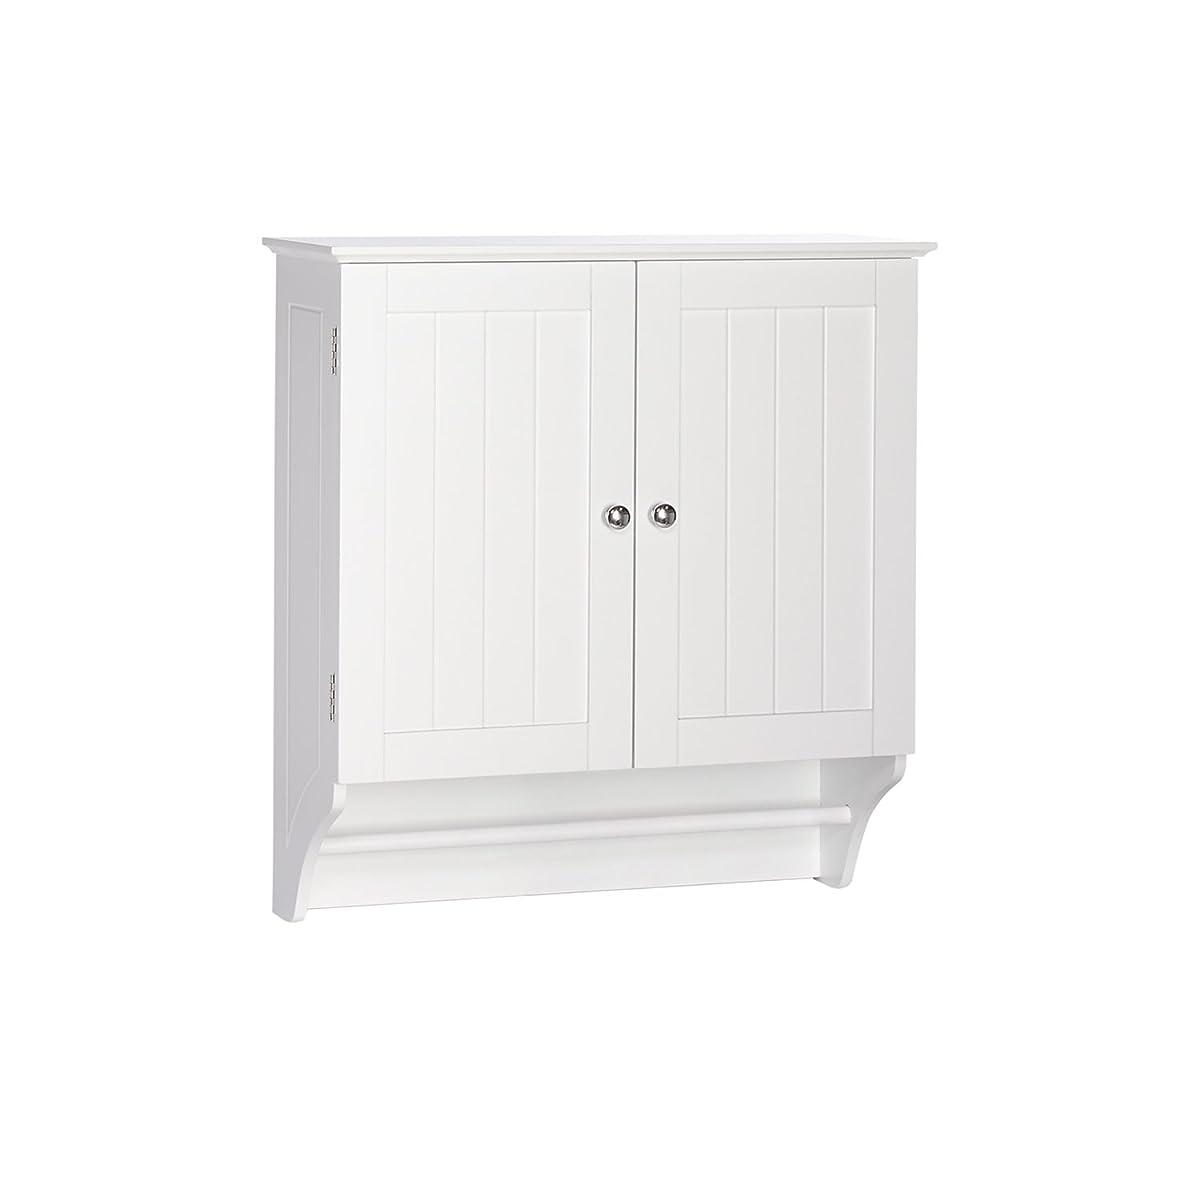 RiverRidge Ashland Collection - 2-Door Wall Cabinet - White